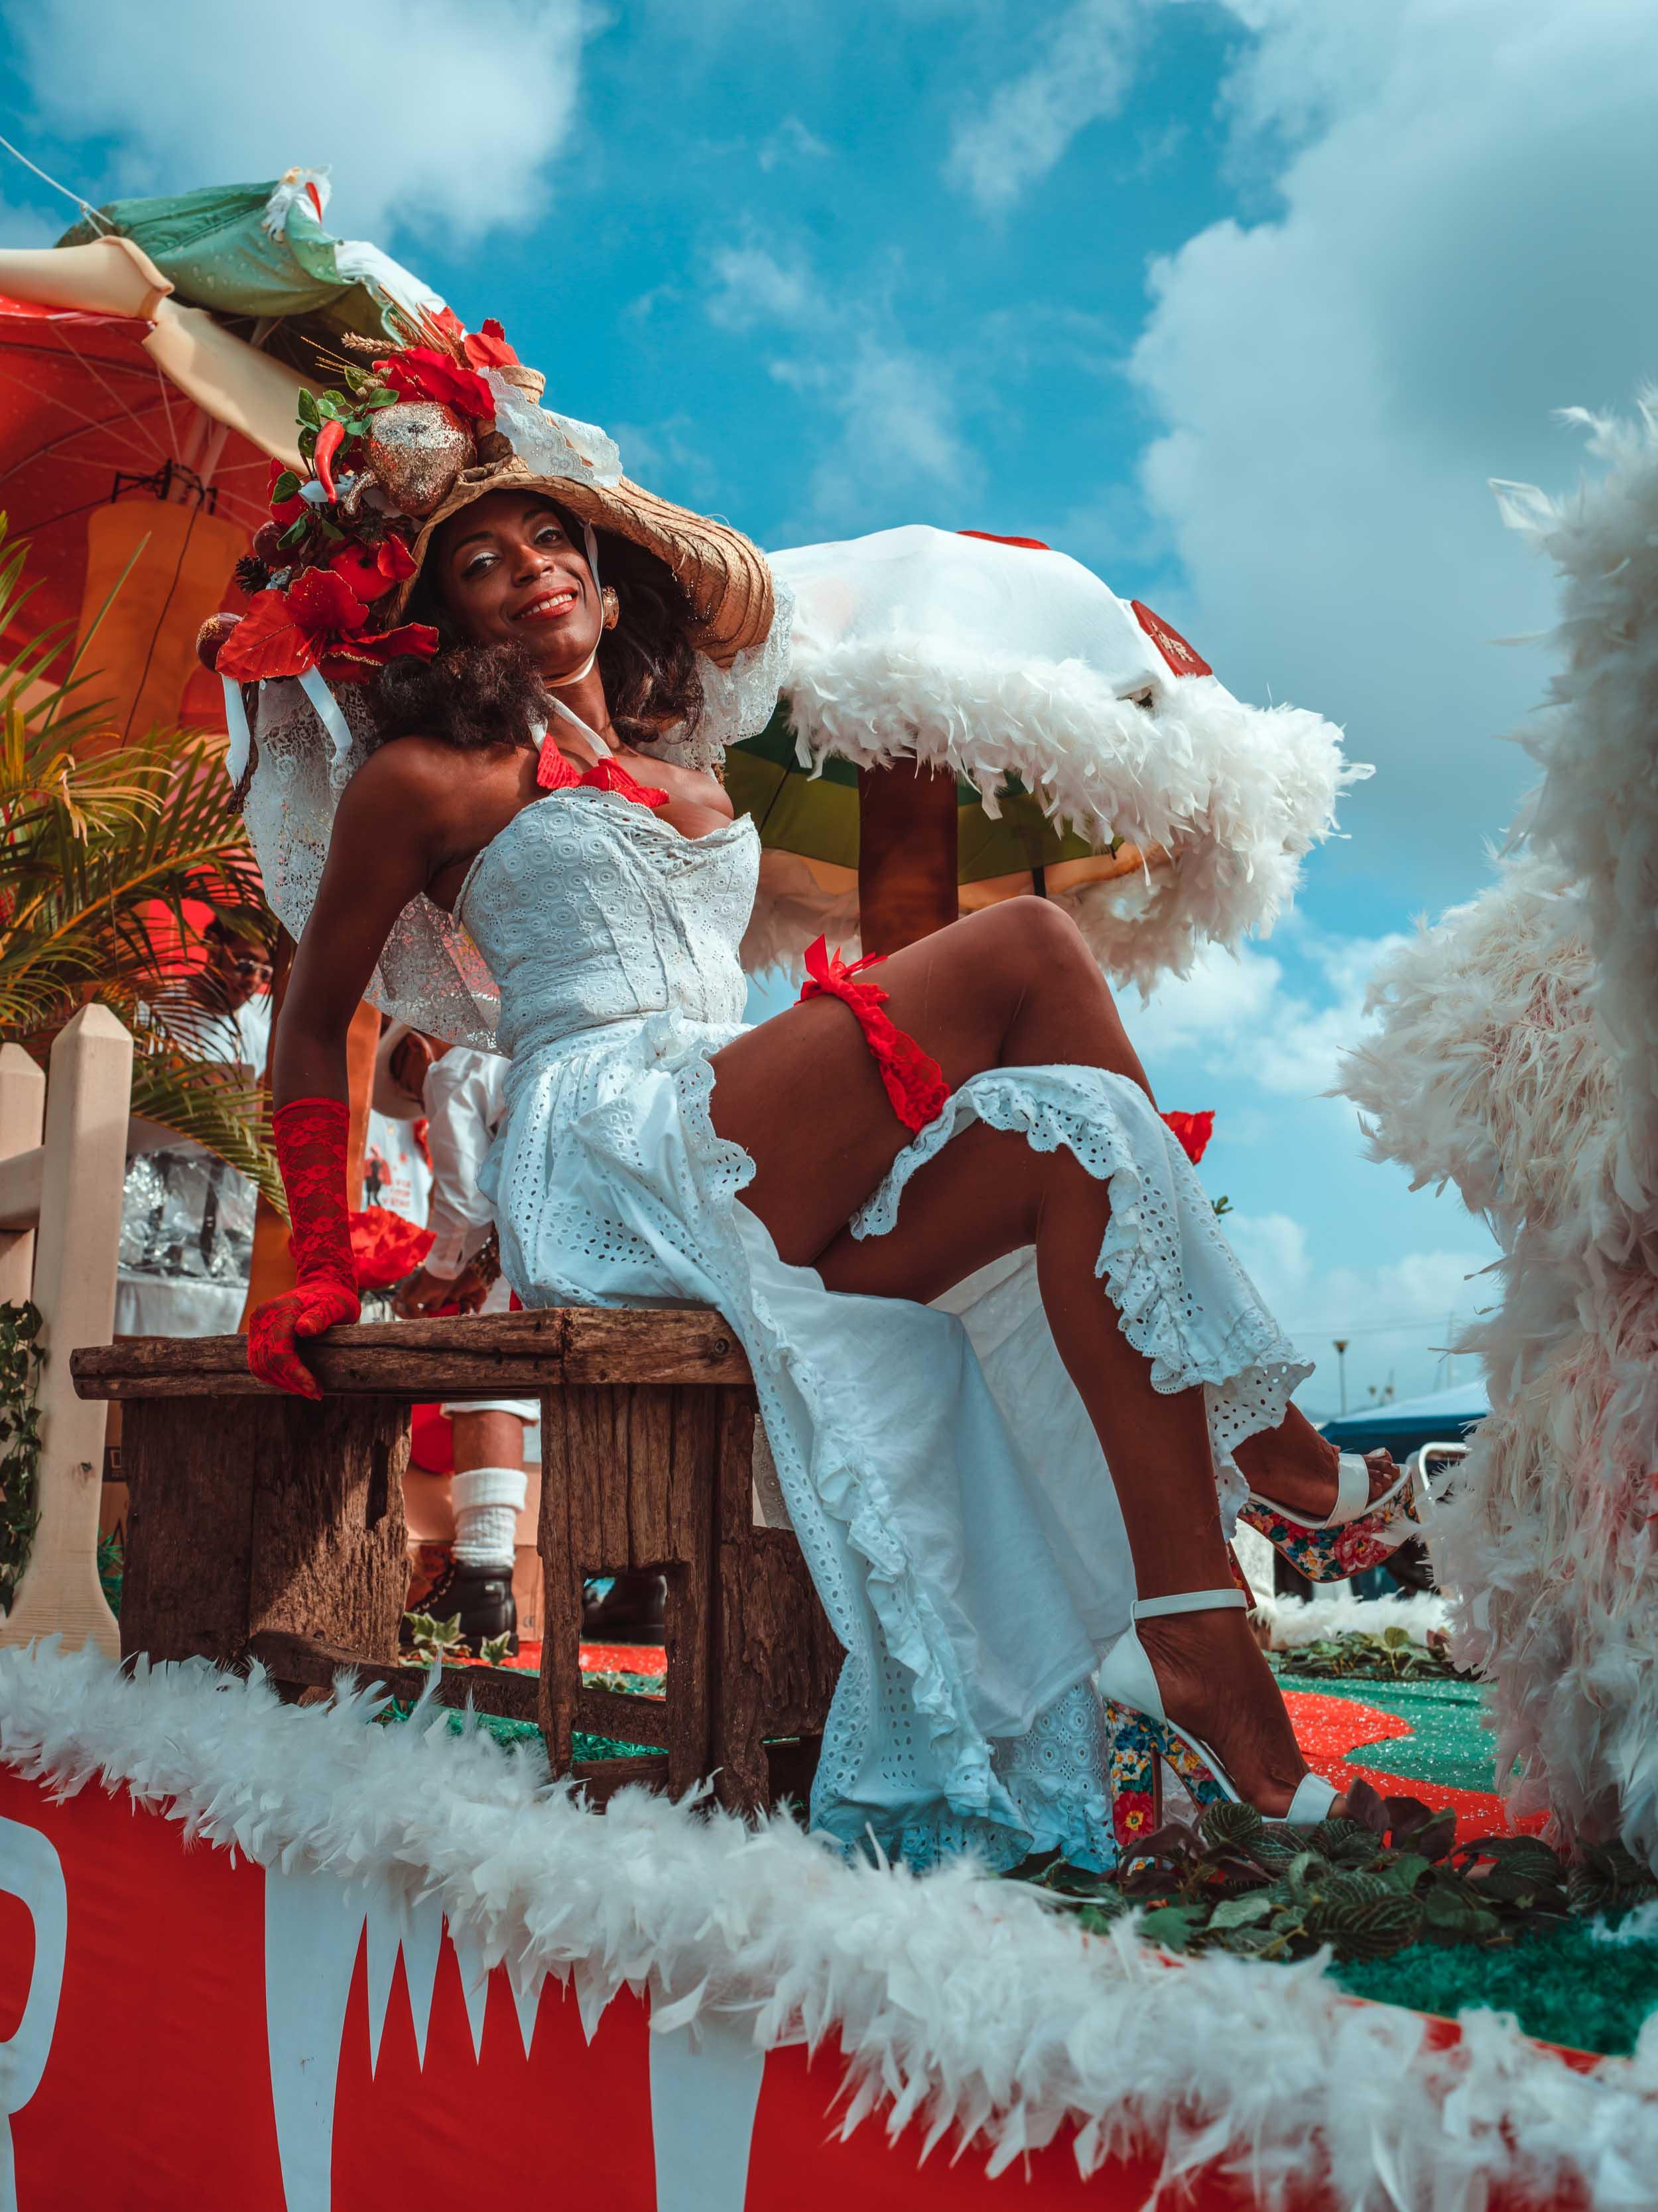 180213_SK_Martinique-27.jpg